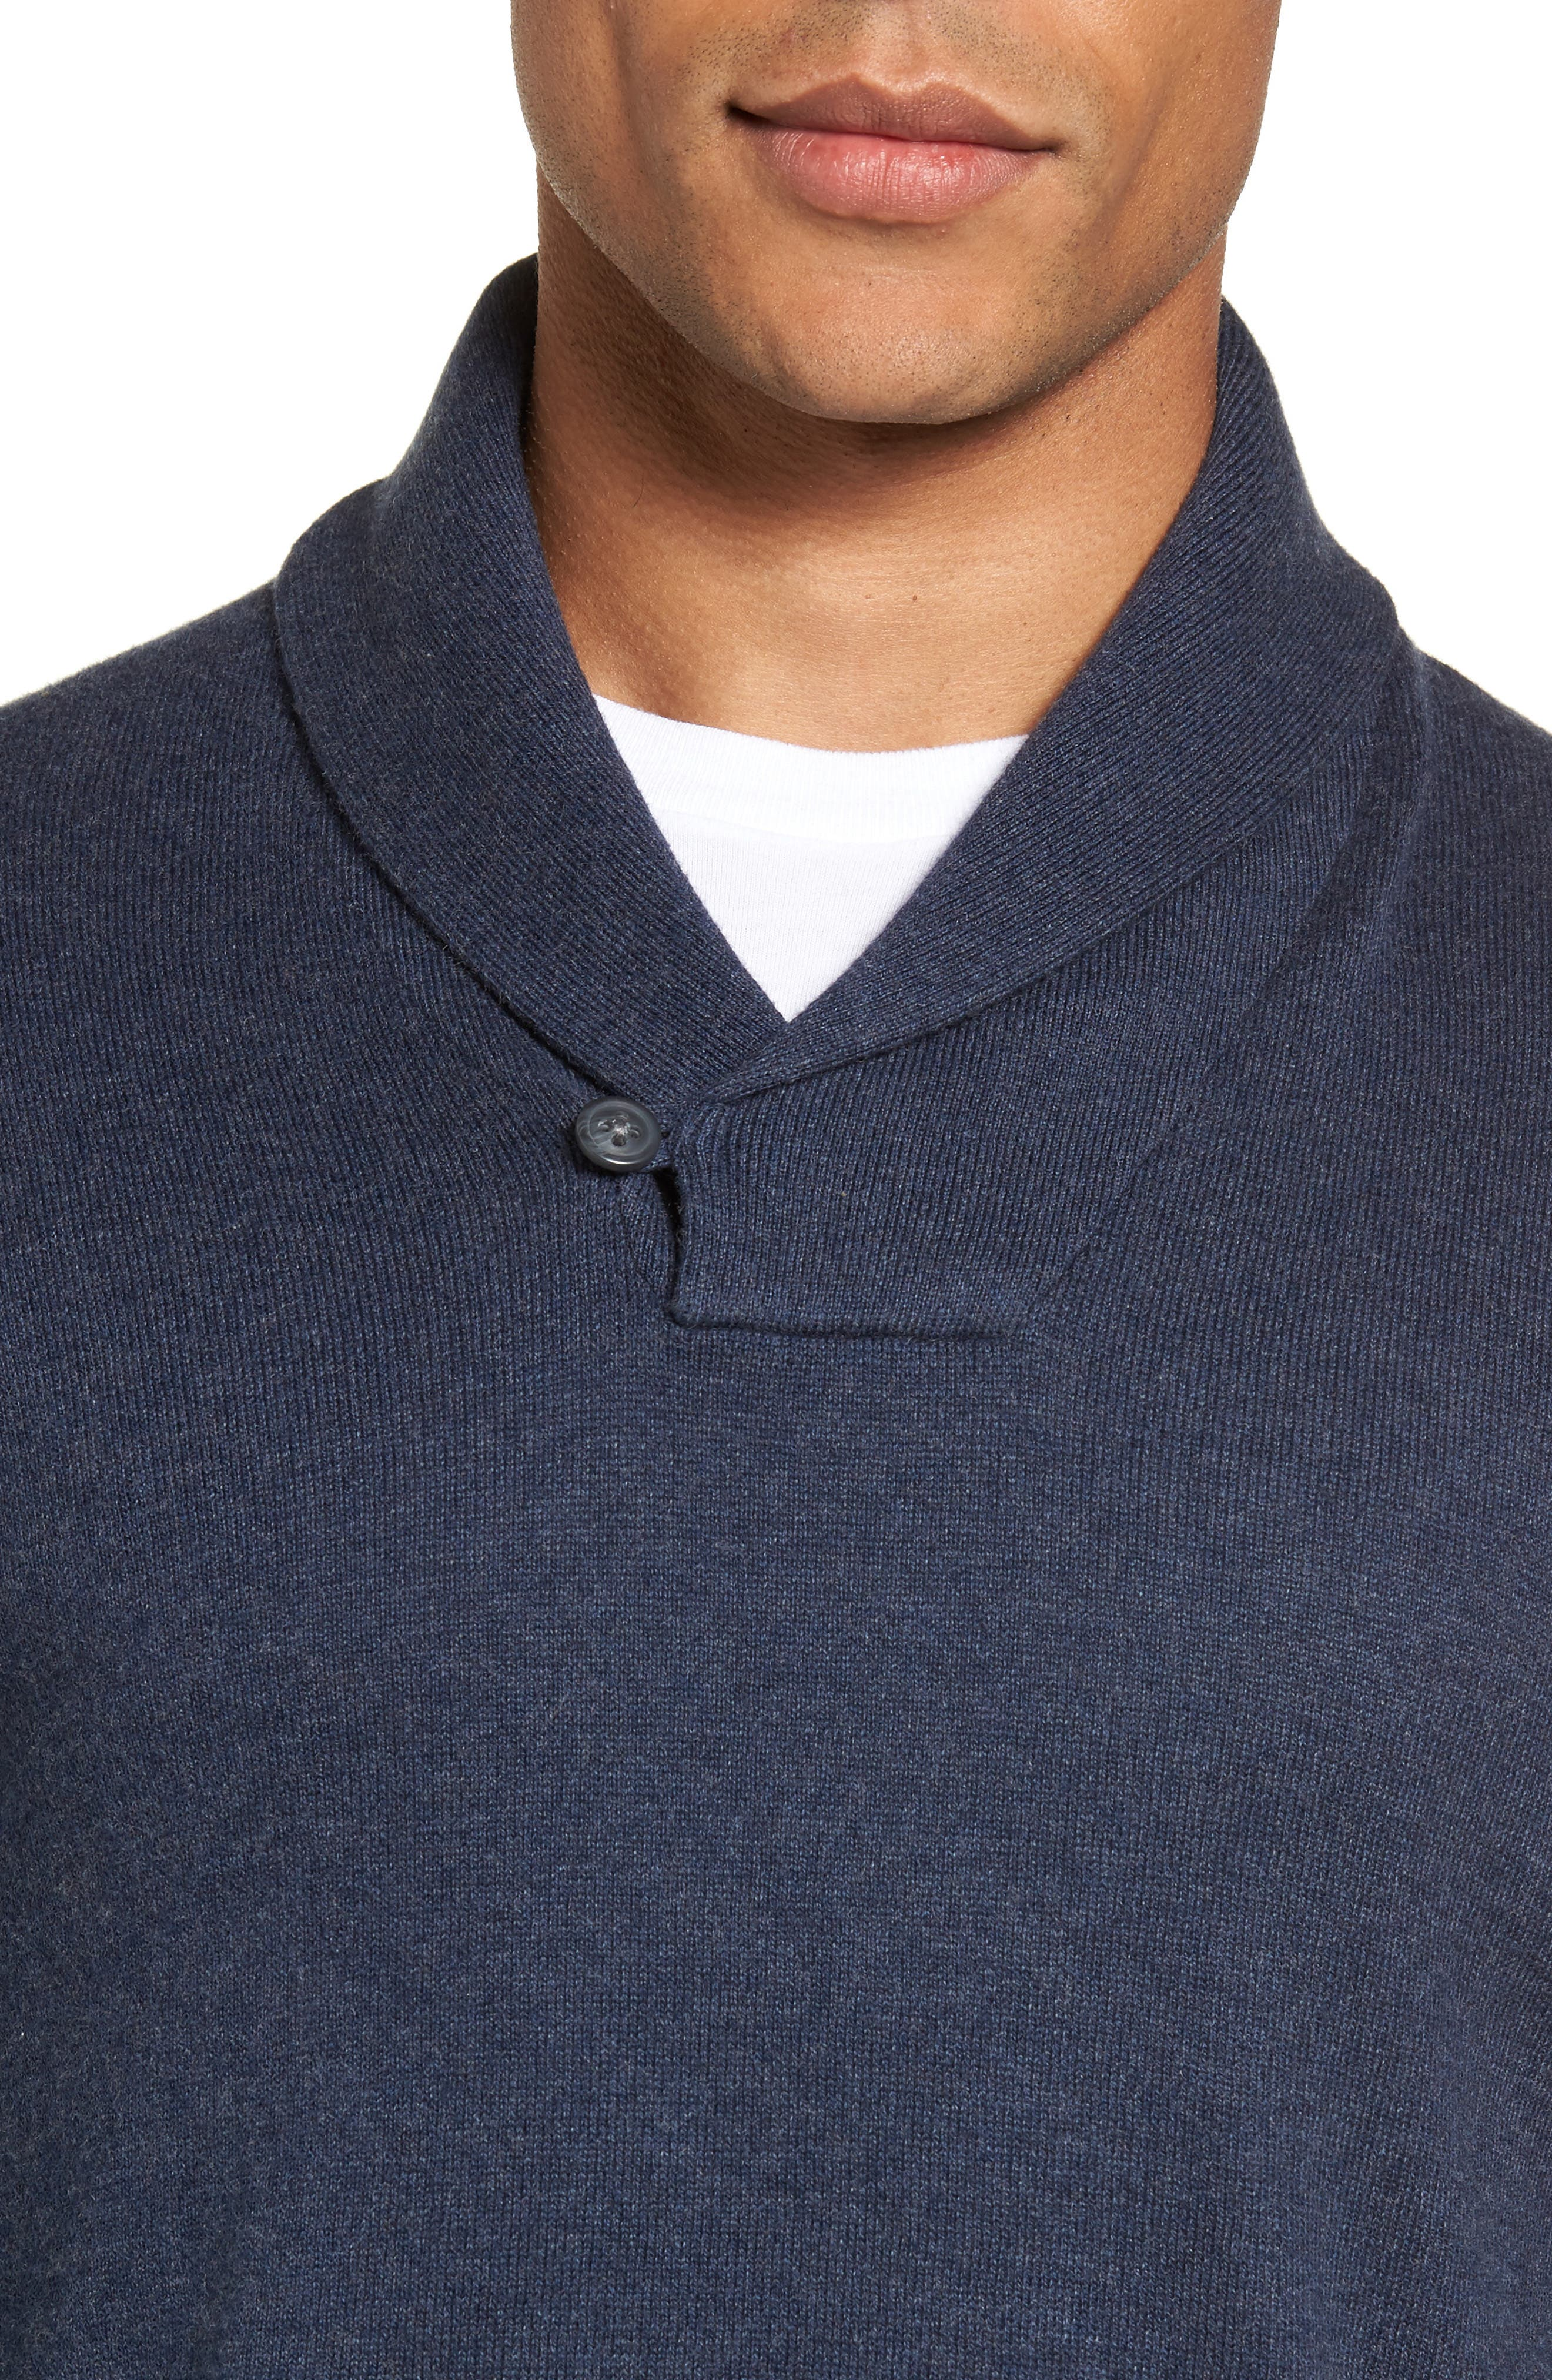 Alternate Image 4  - Nordstrom Men's Shop Cotton & Cashmere Shawl Collar Sweater (Regular & Tall)